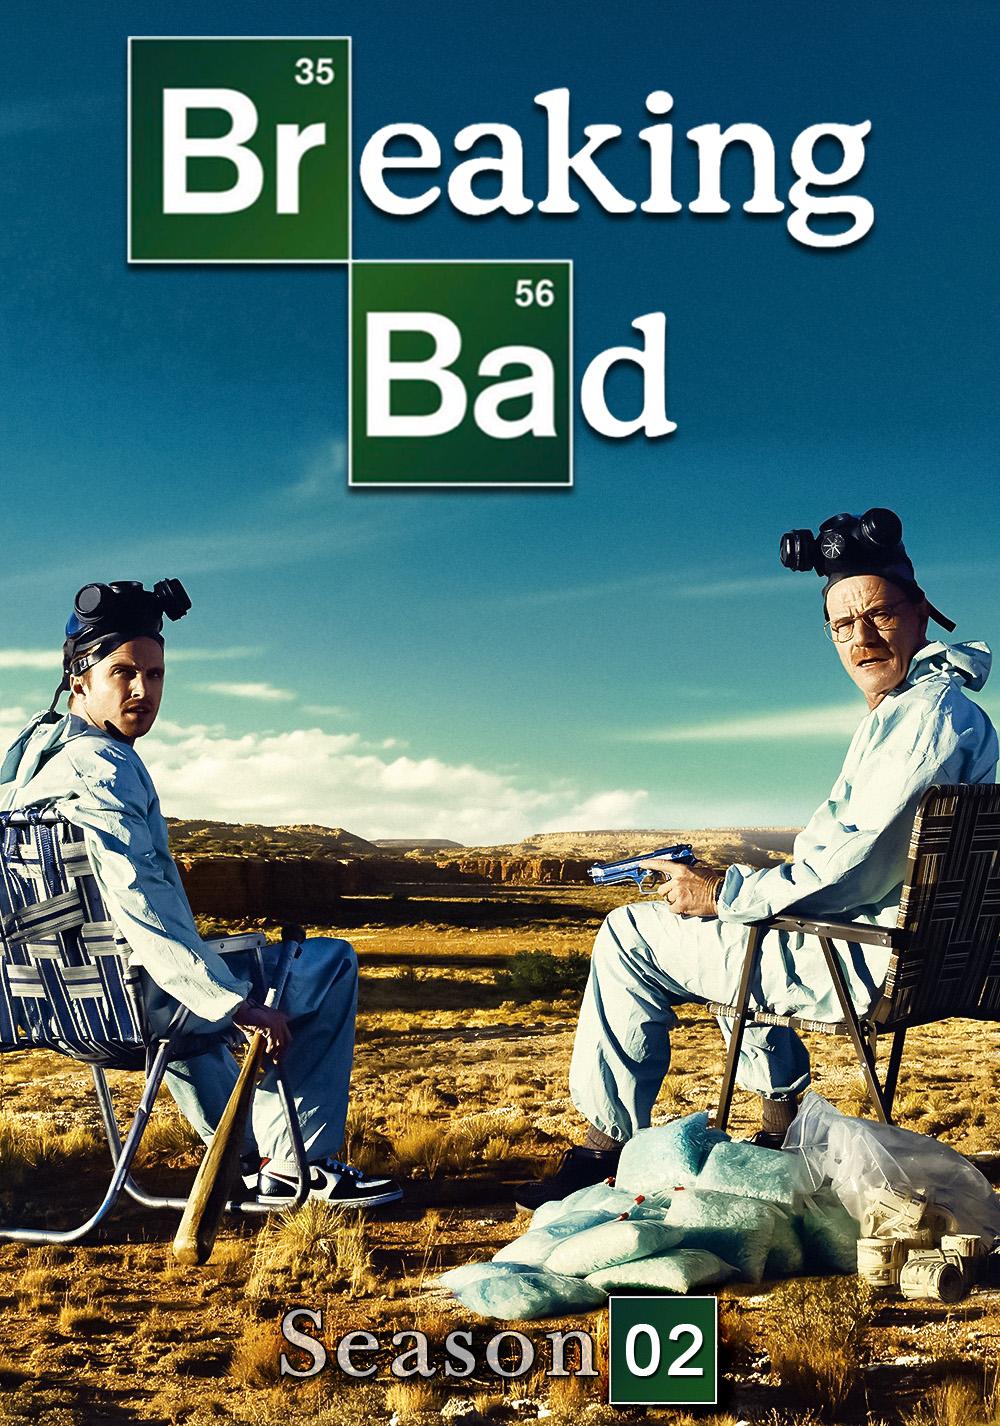 Breaking Bad Trailer (First Season) - YouTube